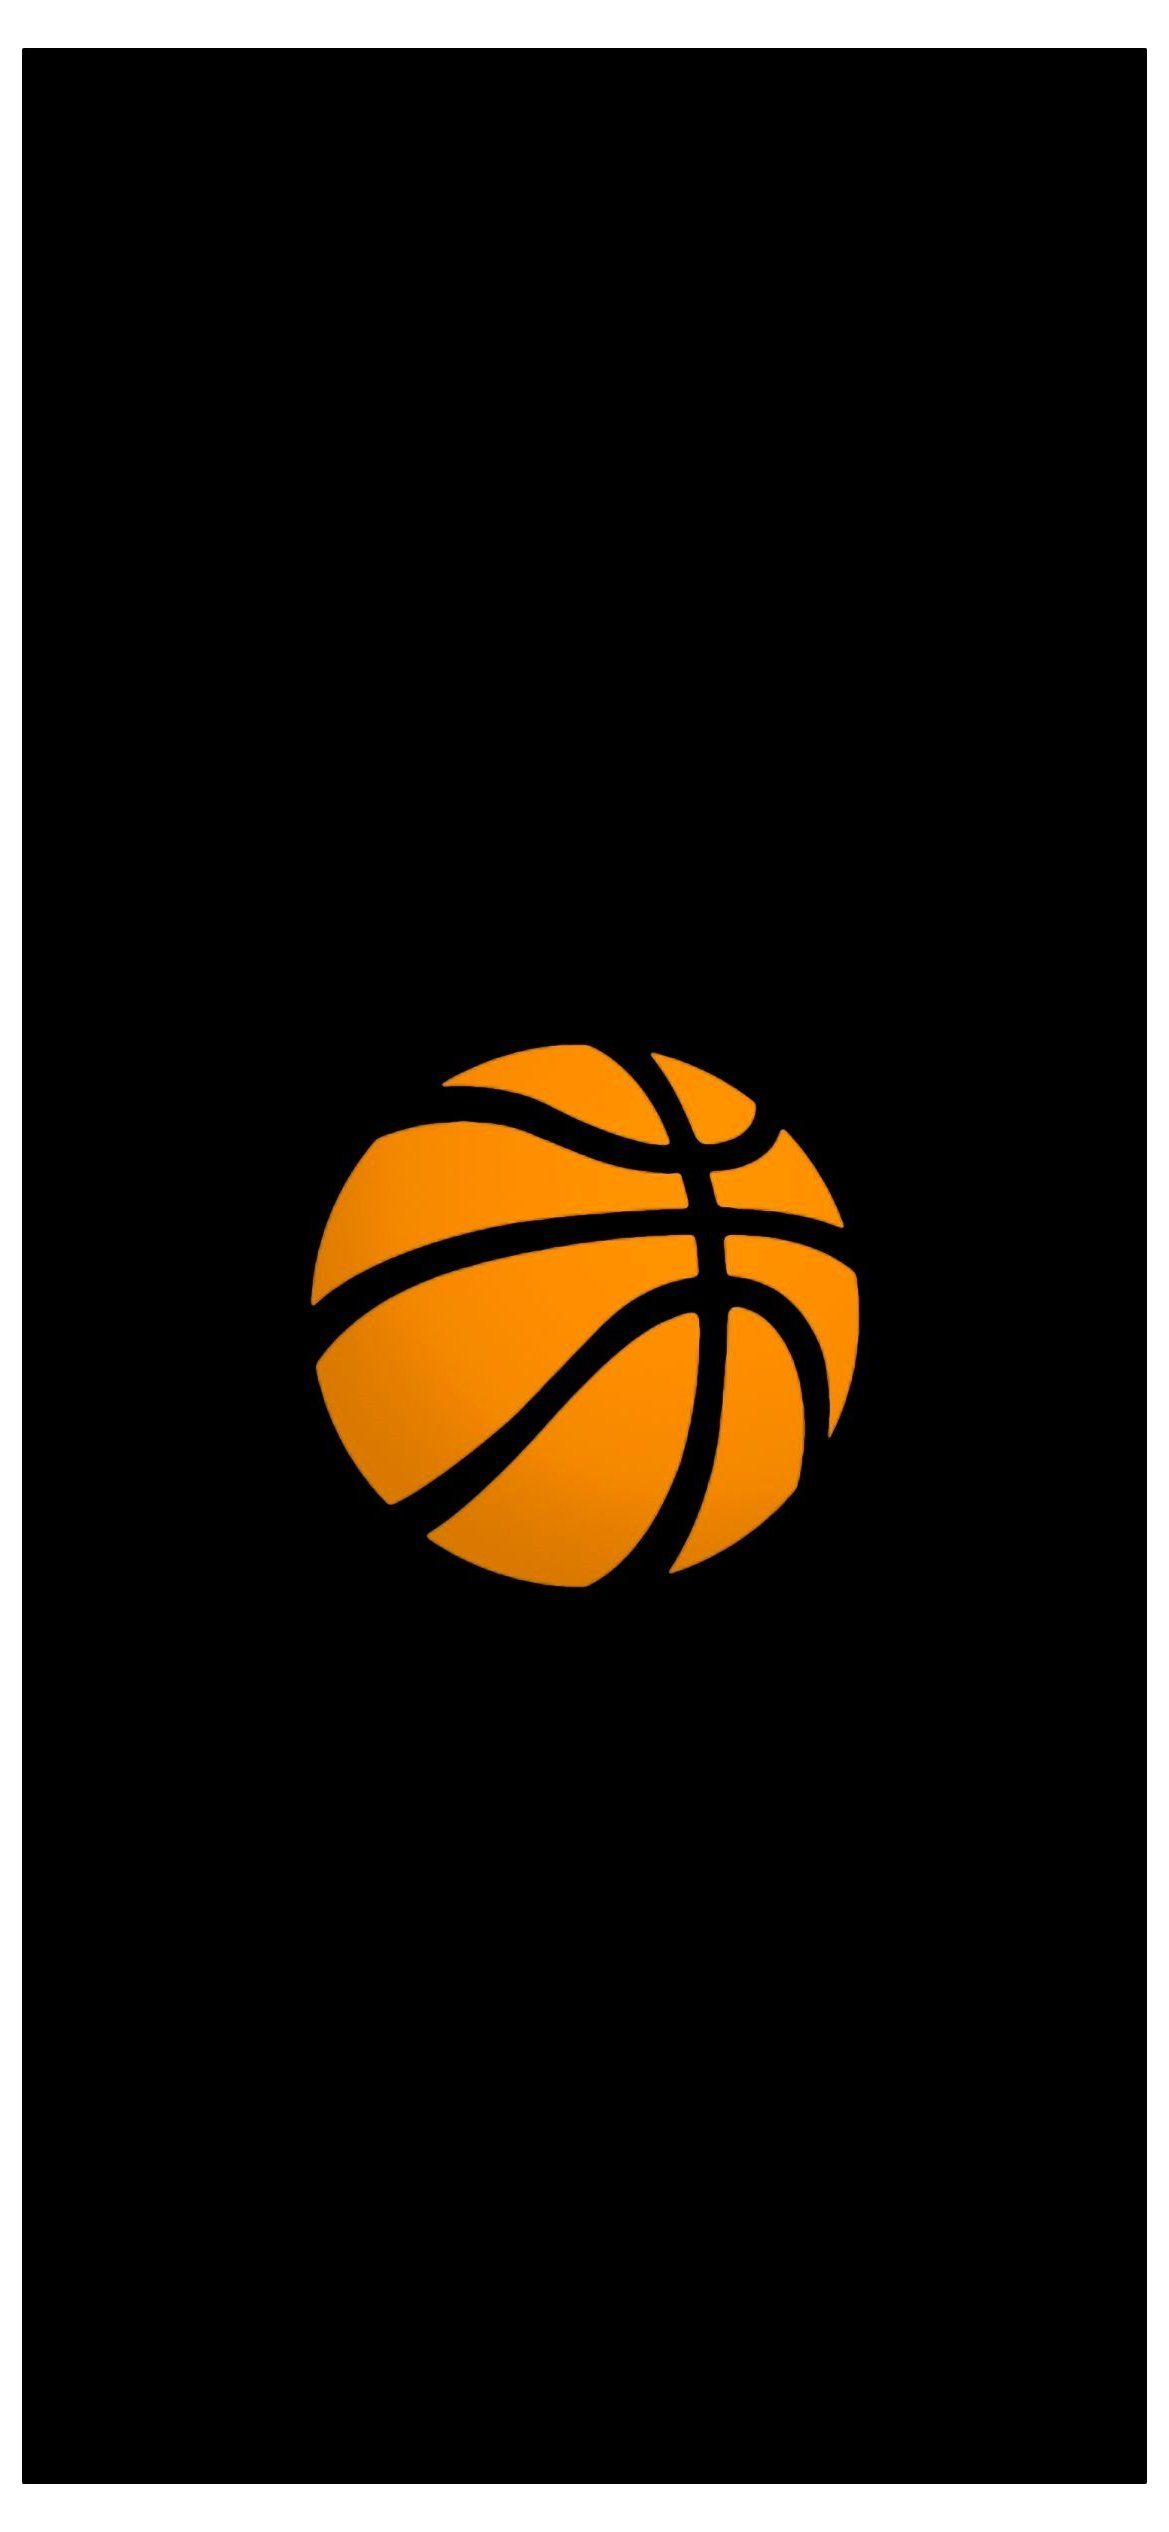 Basketball Wallpaper 4k Iphone Trick Sports Wallpaper Iphone Basketball Sports In 2021 Basketball Wallpaper Cool Basketball Wallpapers Basketball Iphone Wallpaper